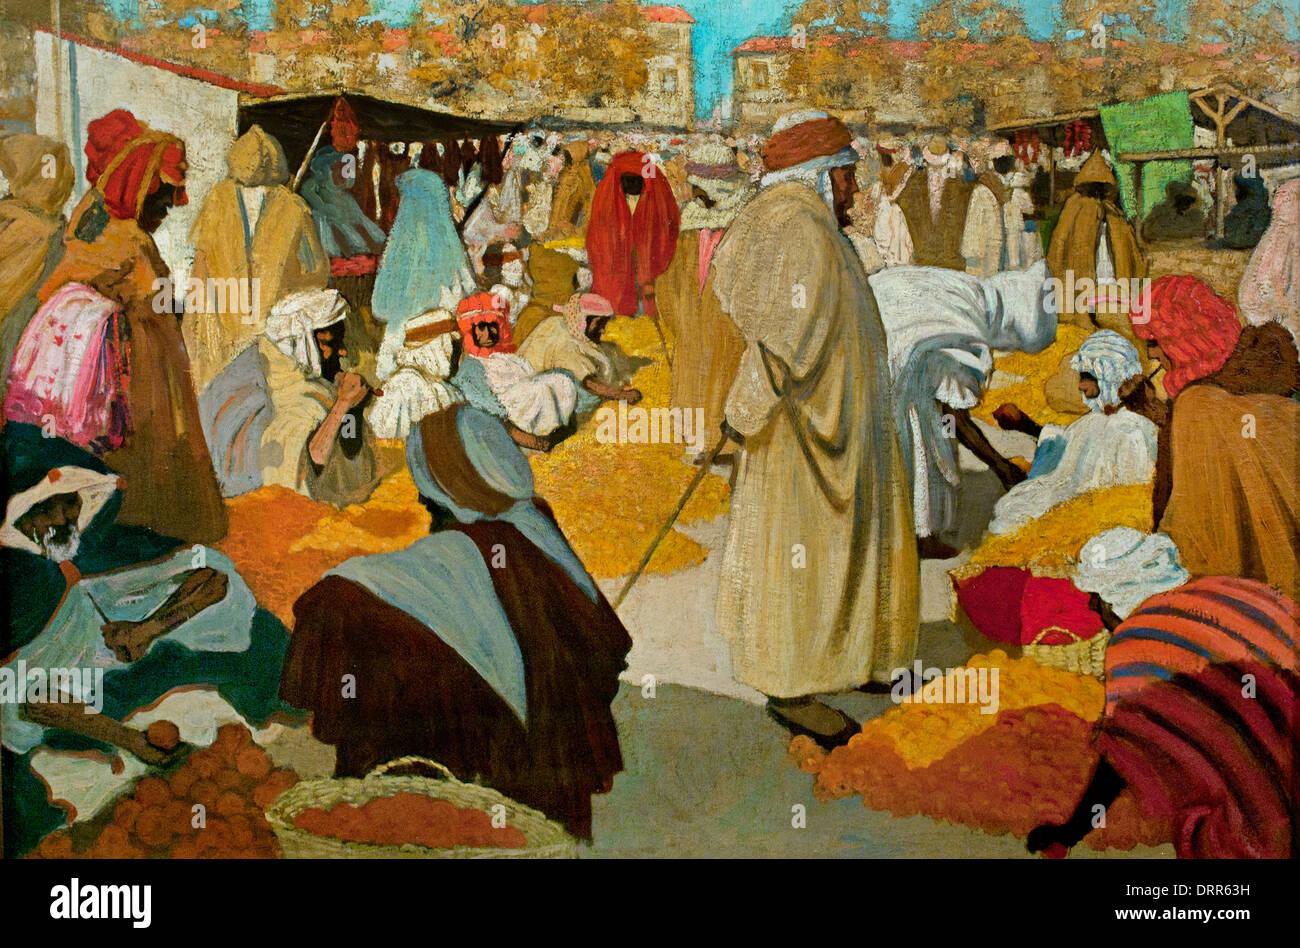 Henri Evenepoel (1872-1899) Mercato arancione a Blidah 1898 Mercato arabo Algeria belga fiamminga del Belgio Immagini Stock